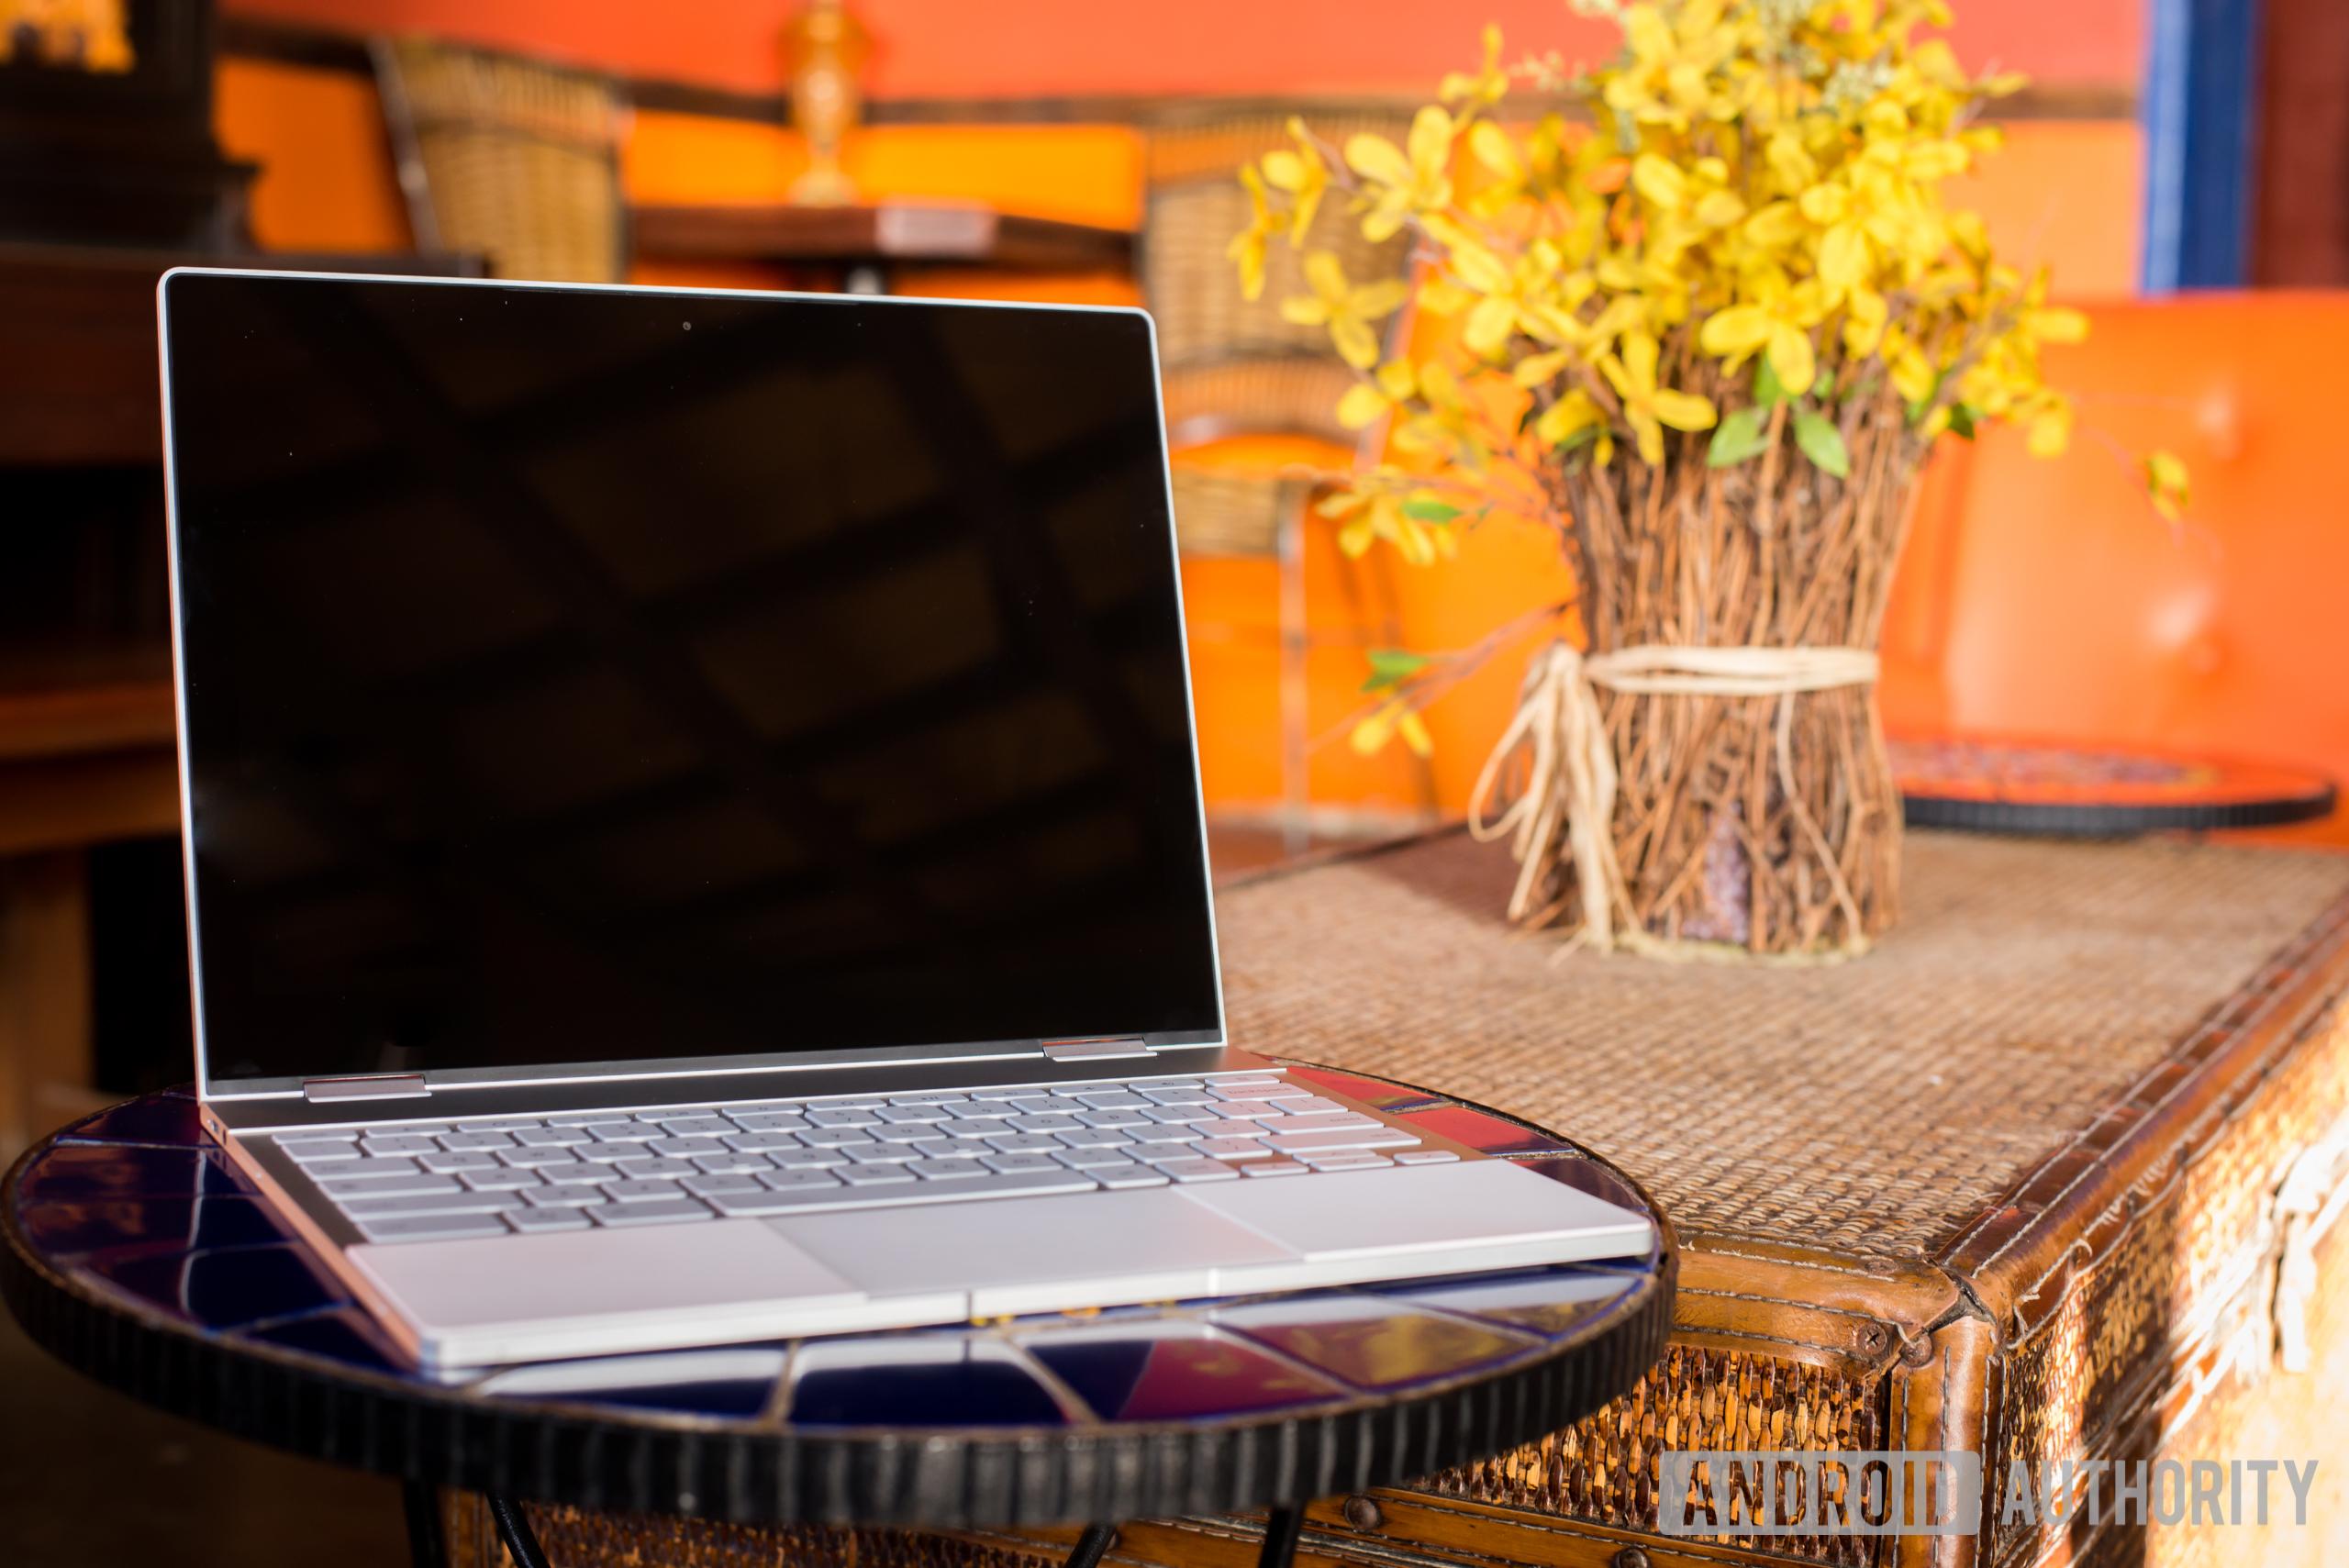 pixelbook on table